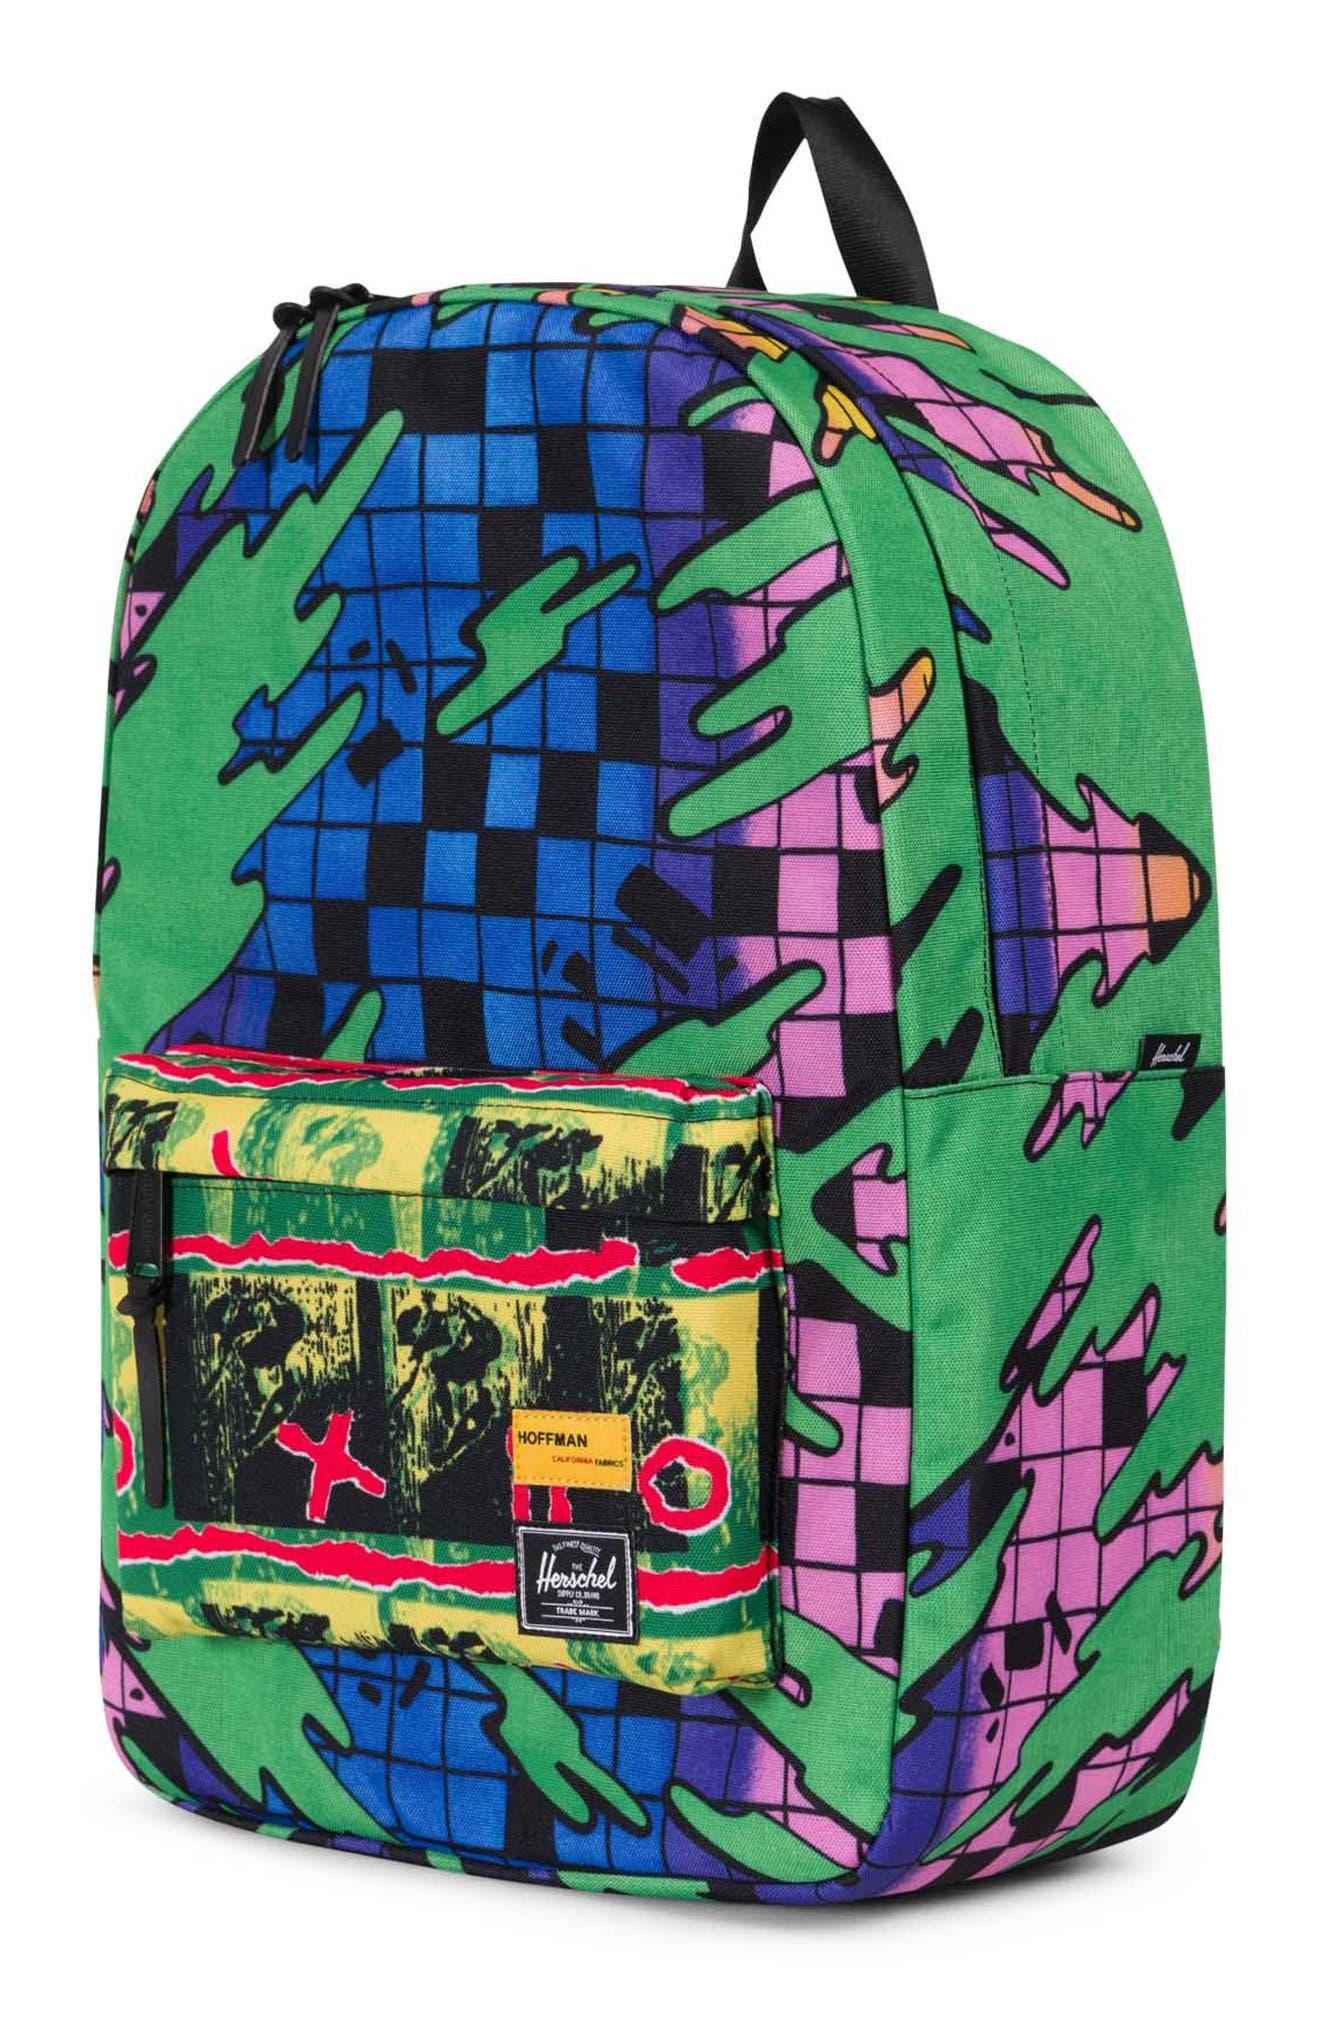 Hoffman Winlaw Backpack,                             Alternate thumbnail 4, color,                             Green